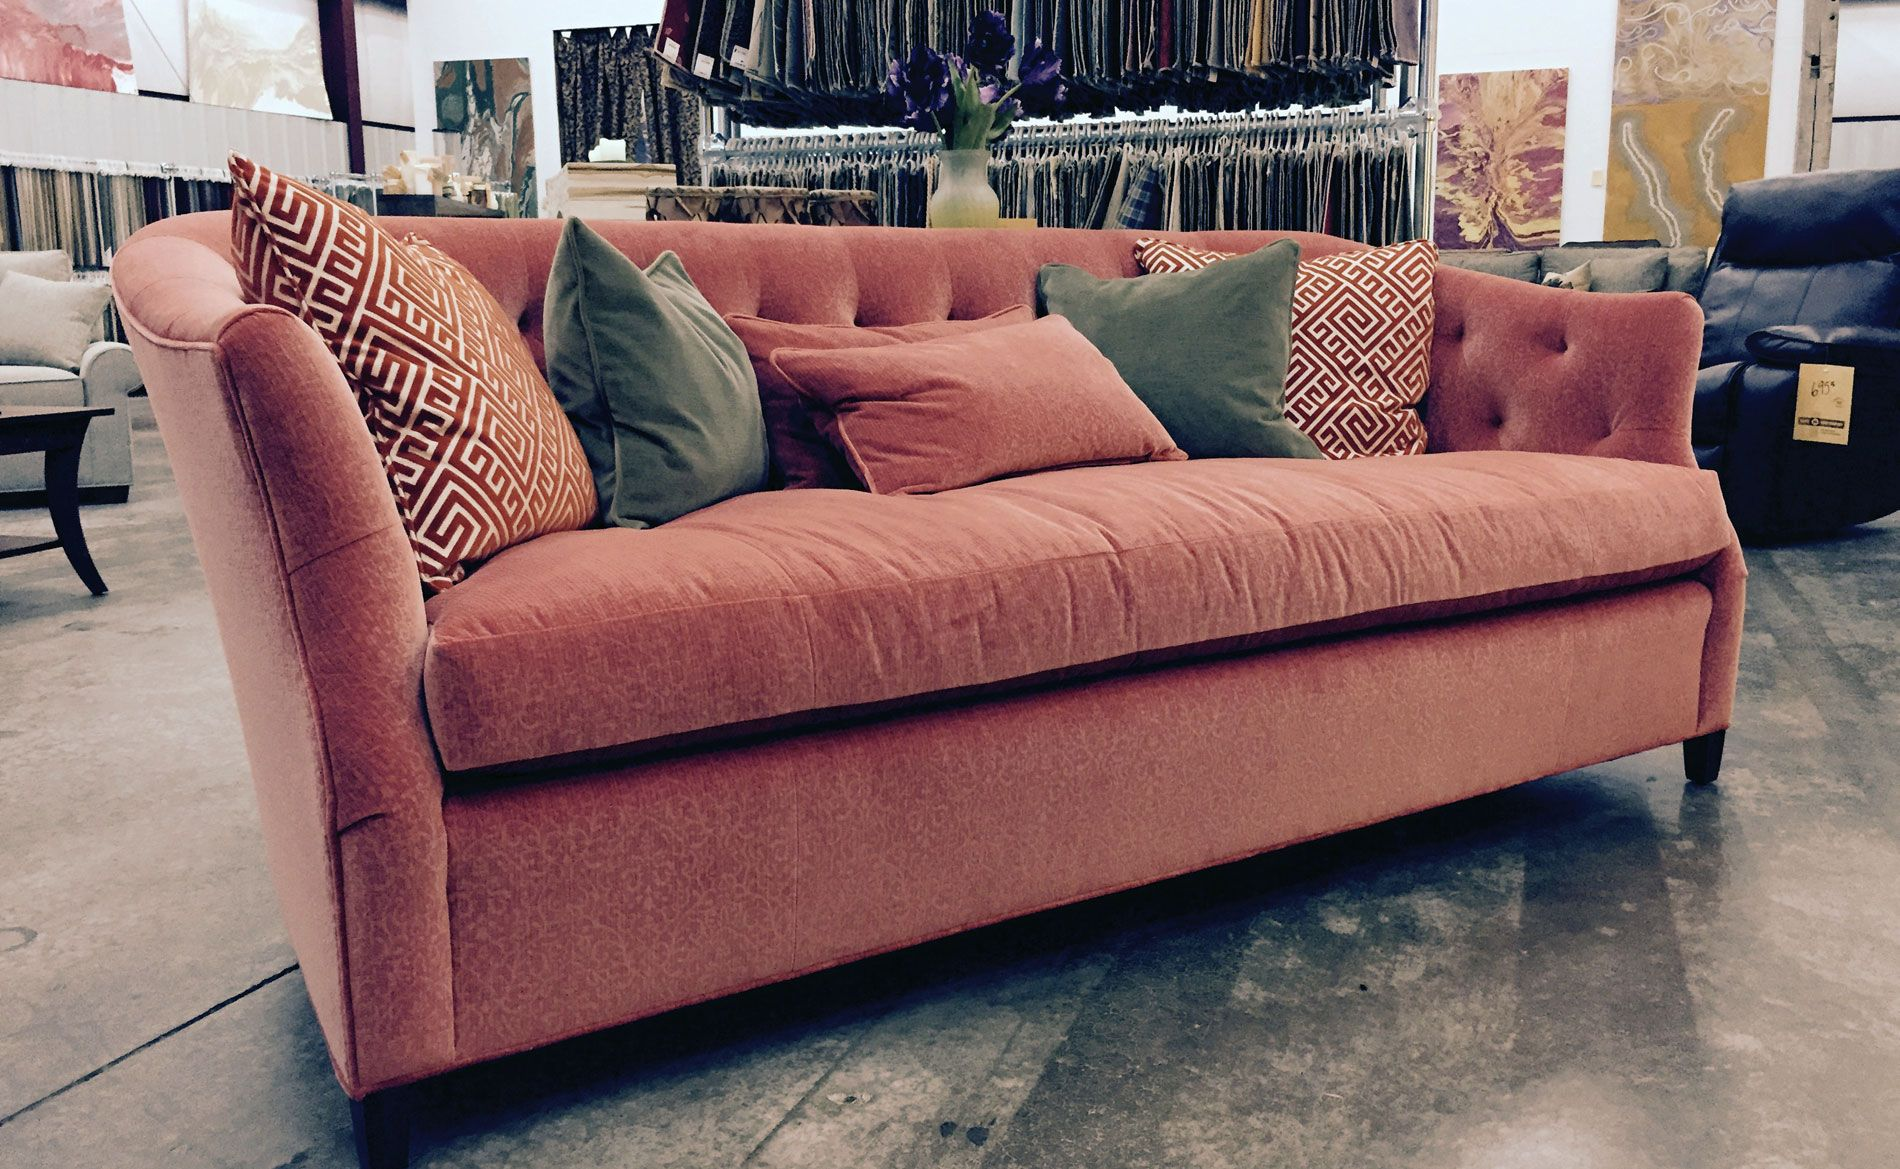 Nett sofa pany Deutsche Deko